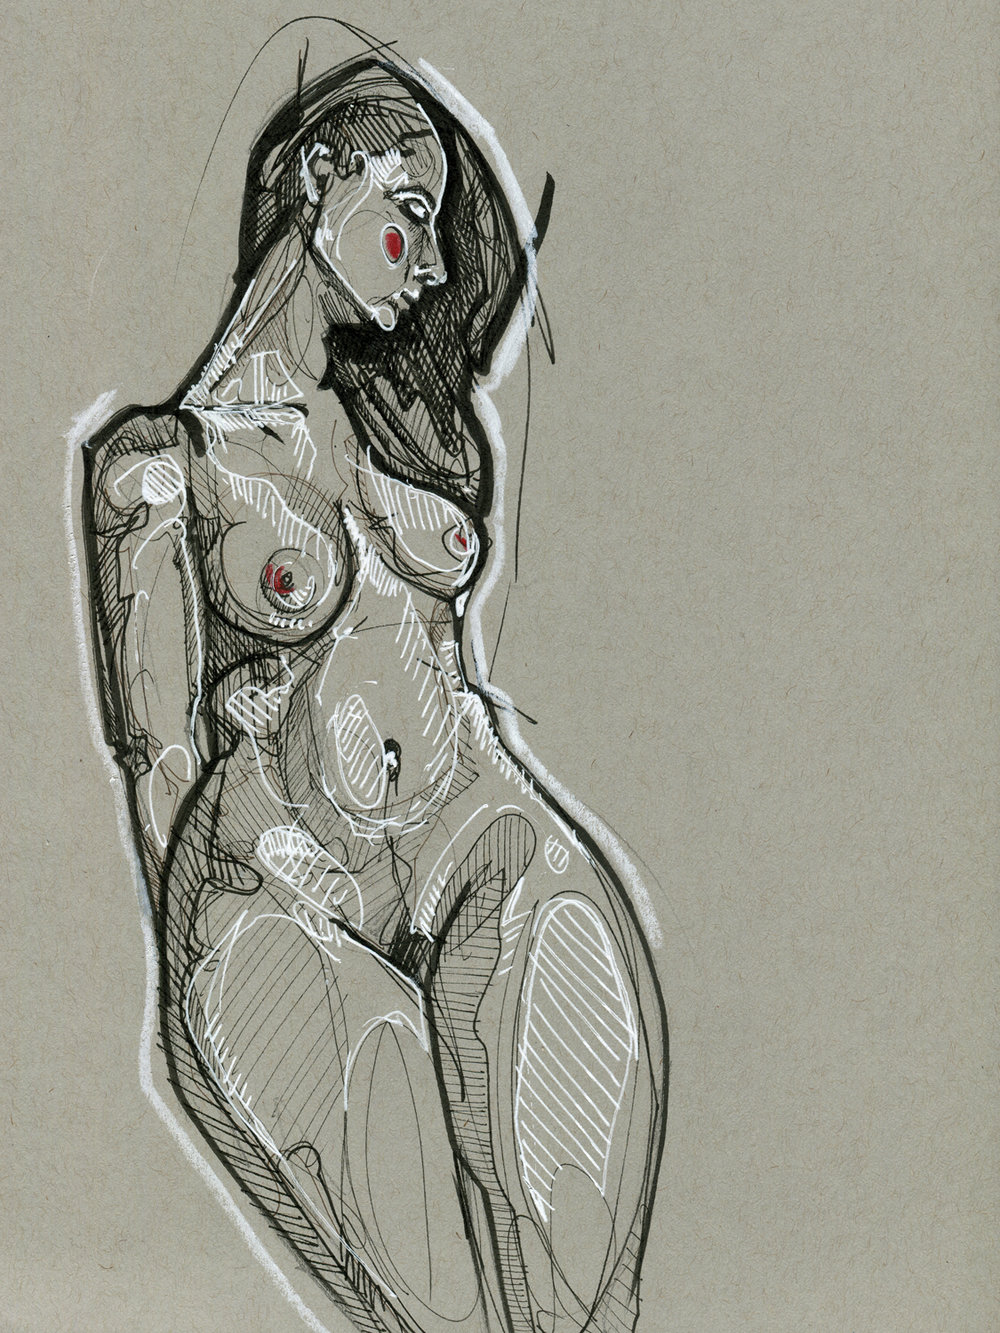 Gray Figure Study #4